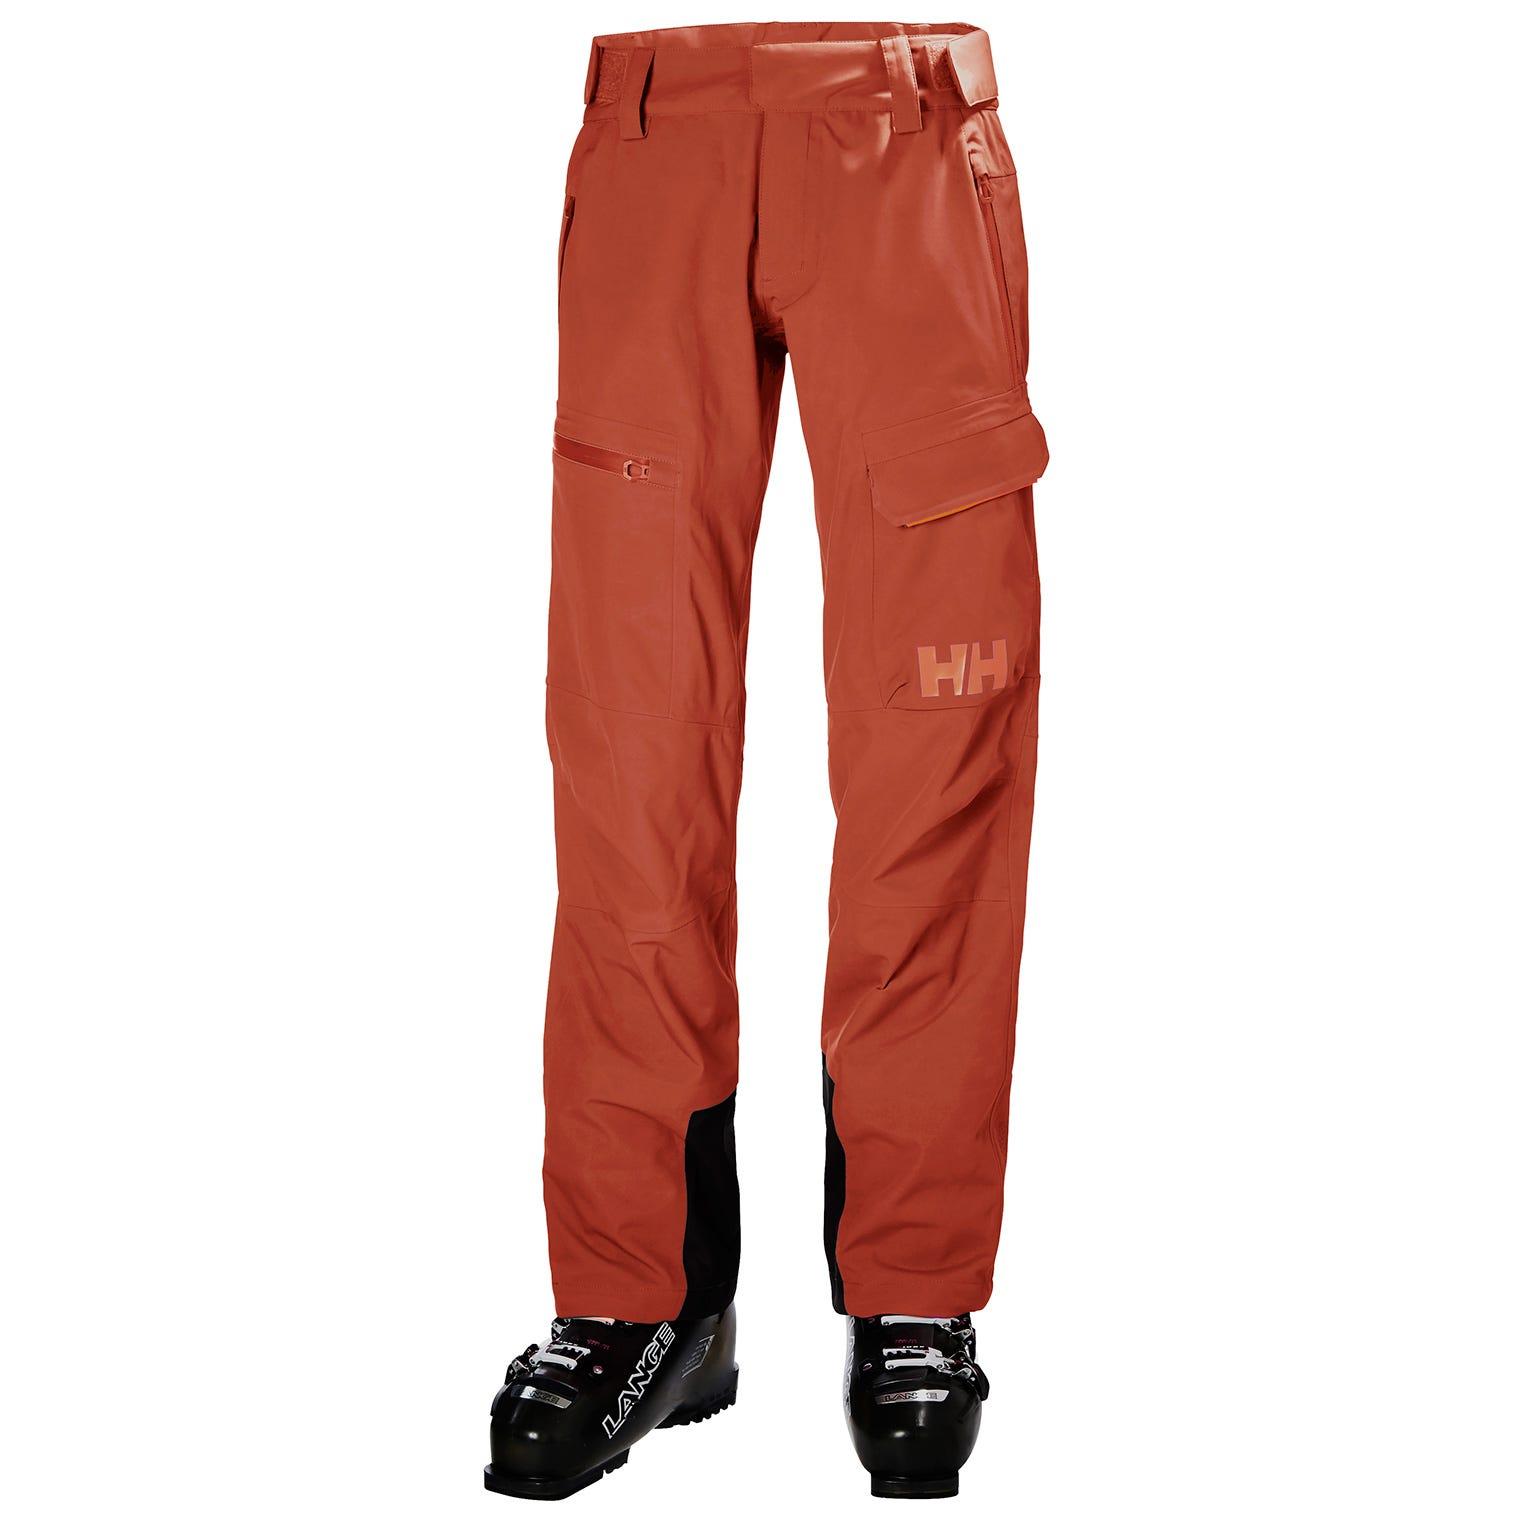 Helly Hansen W Aurora Shell 2.0 Pant Womens Ski Red S